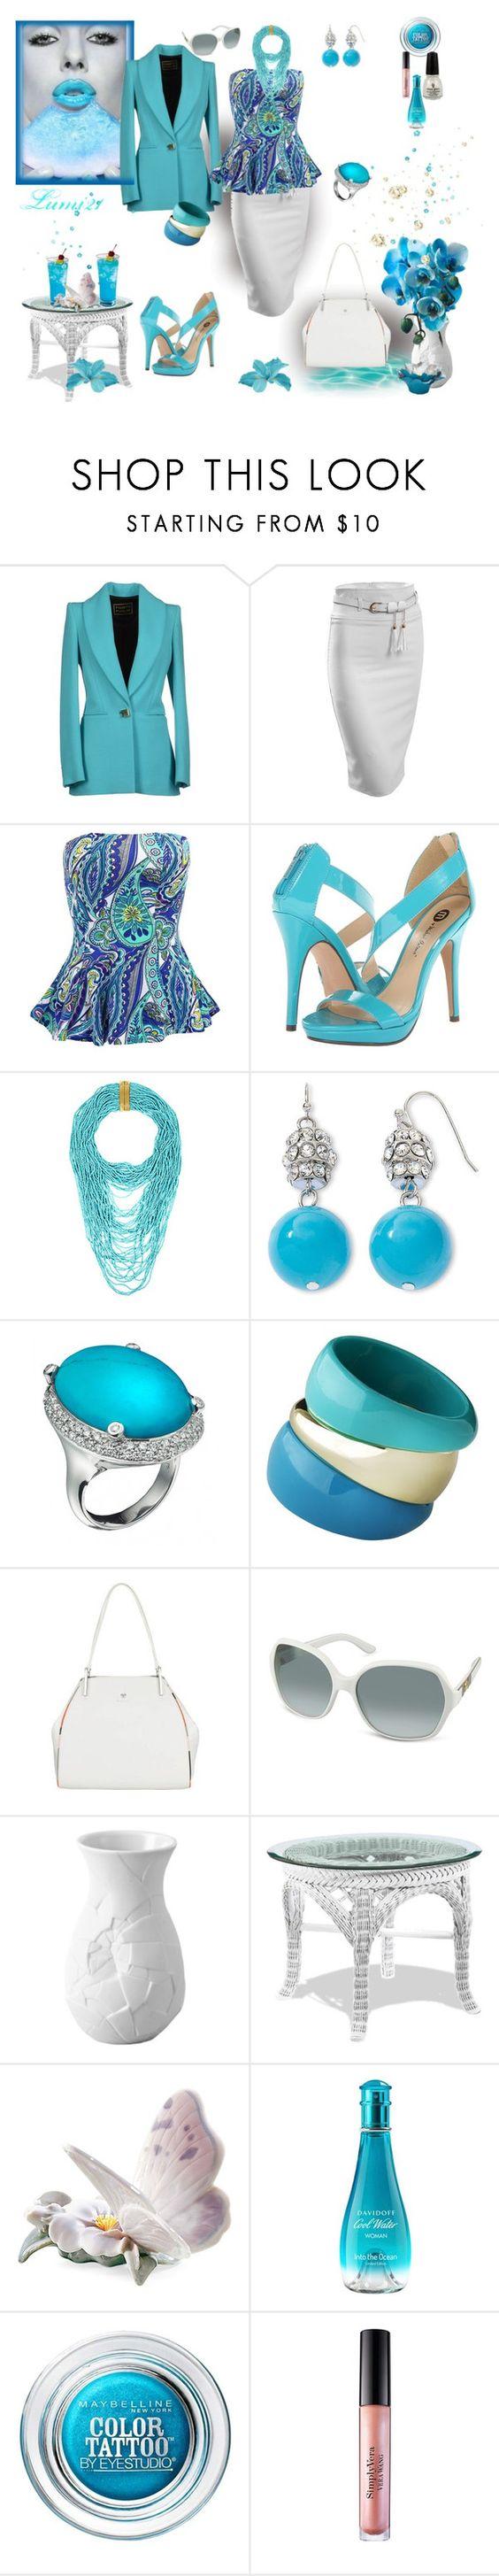 """elegance blue summer"" by lumi-21 ❤ liked on Polyvore featuring FAUSTO PUGLISI, LE3NO, Michael Antonio, BCBGMAXAZRIA, Liz Claiborne, Modalu, Gucci, Rosenthal, Lladró and Davidoff"